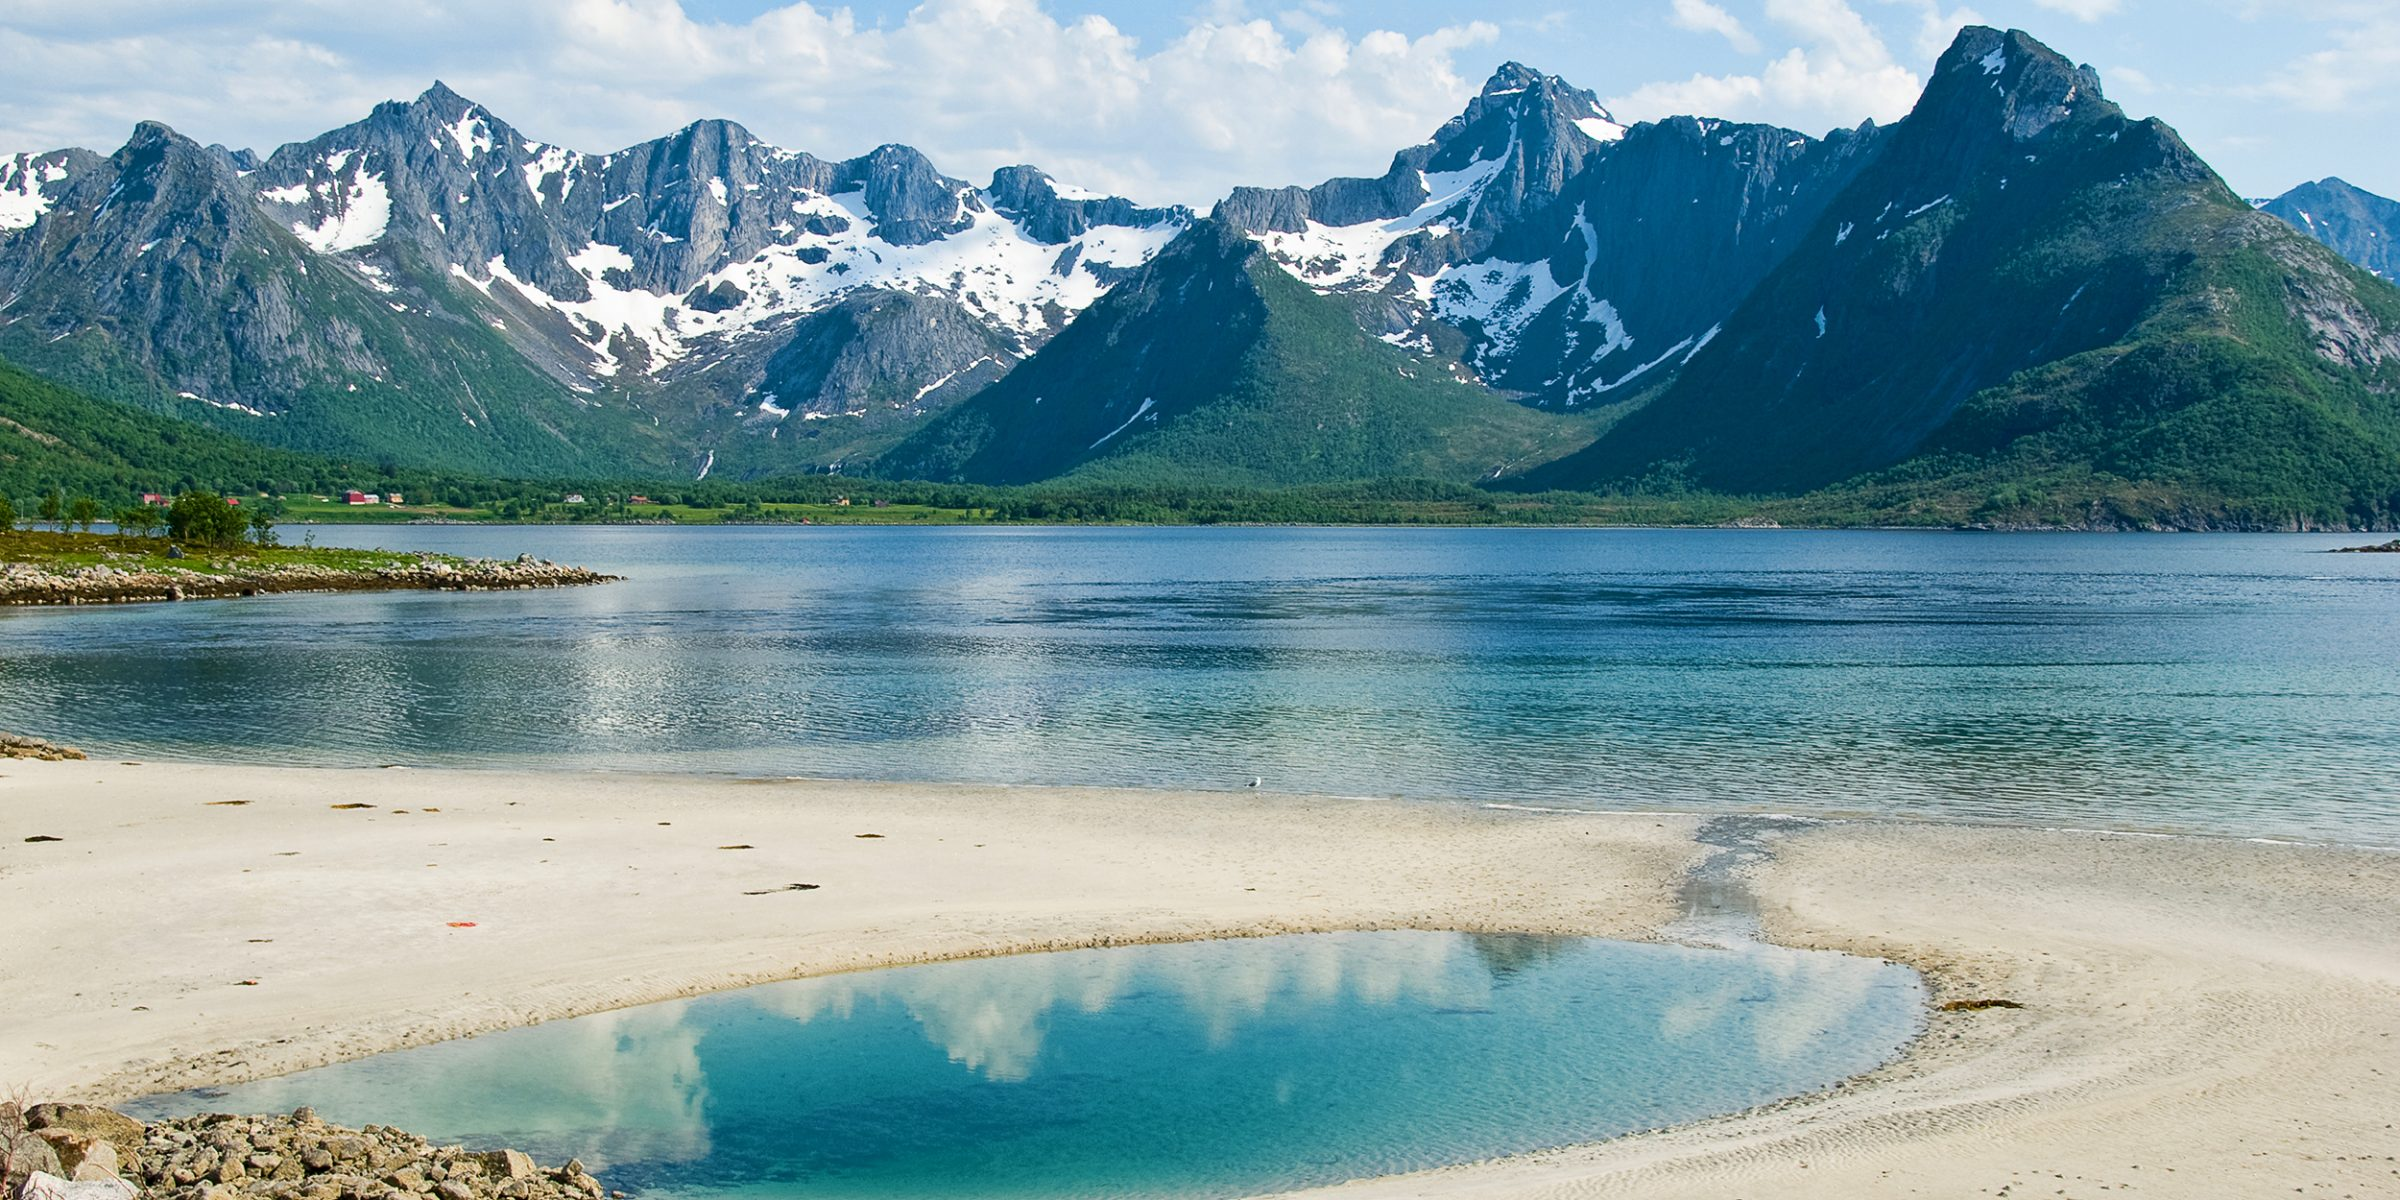 Strand Lofoten Norska Kusten Norge